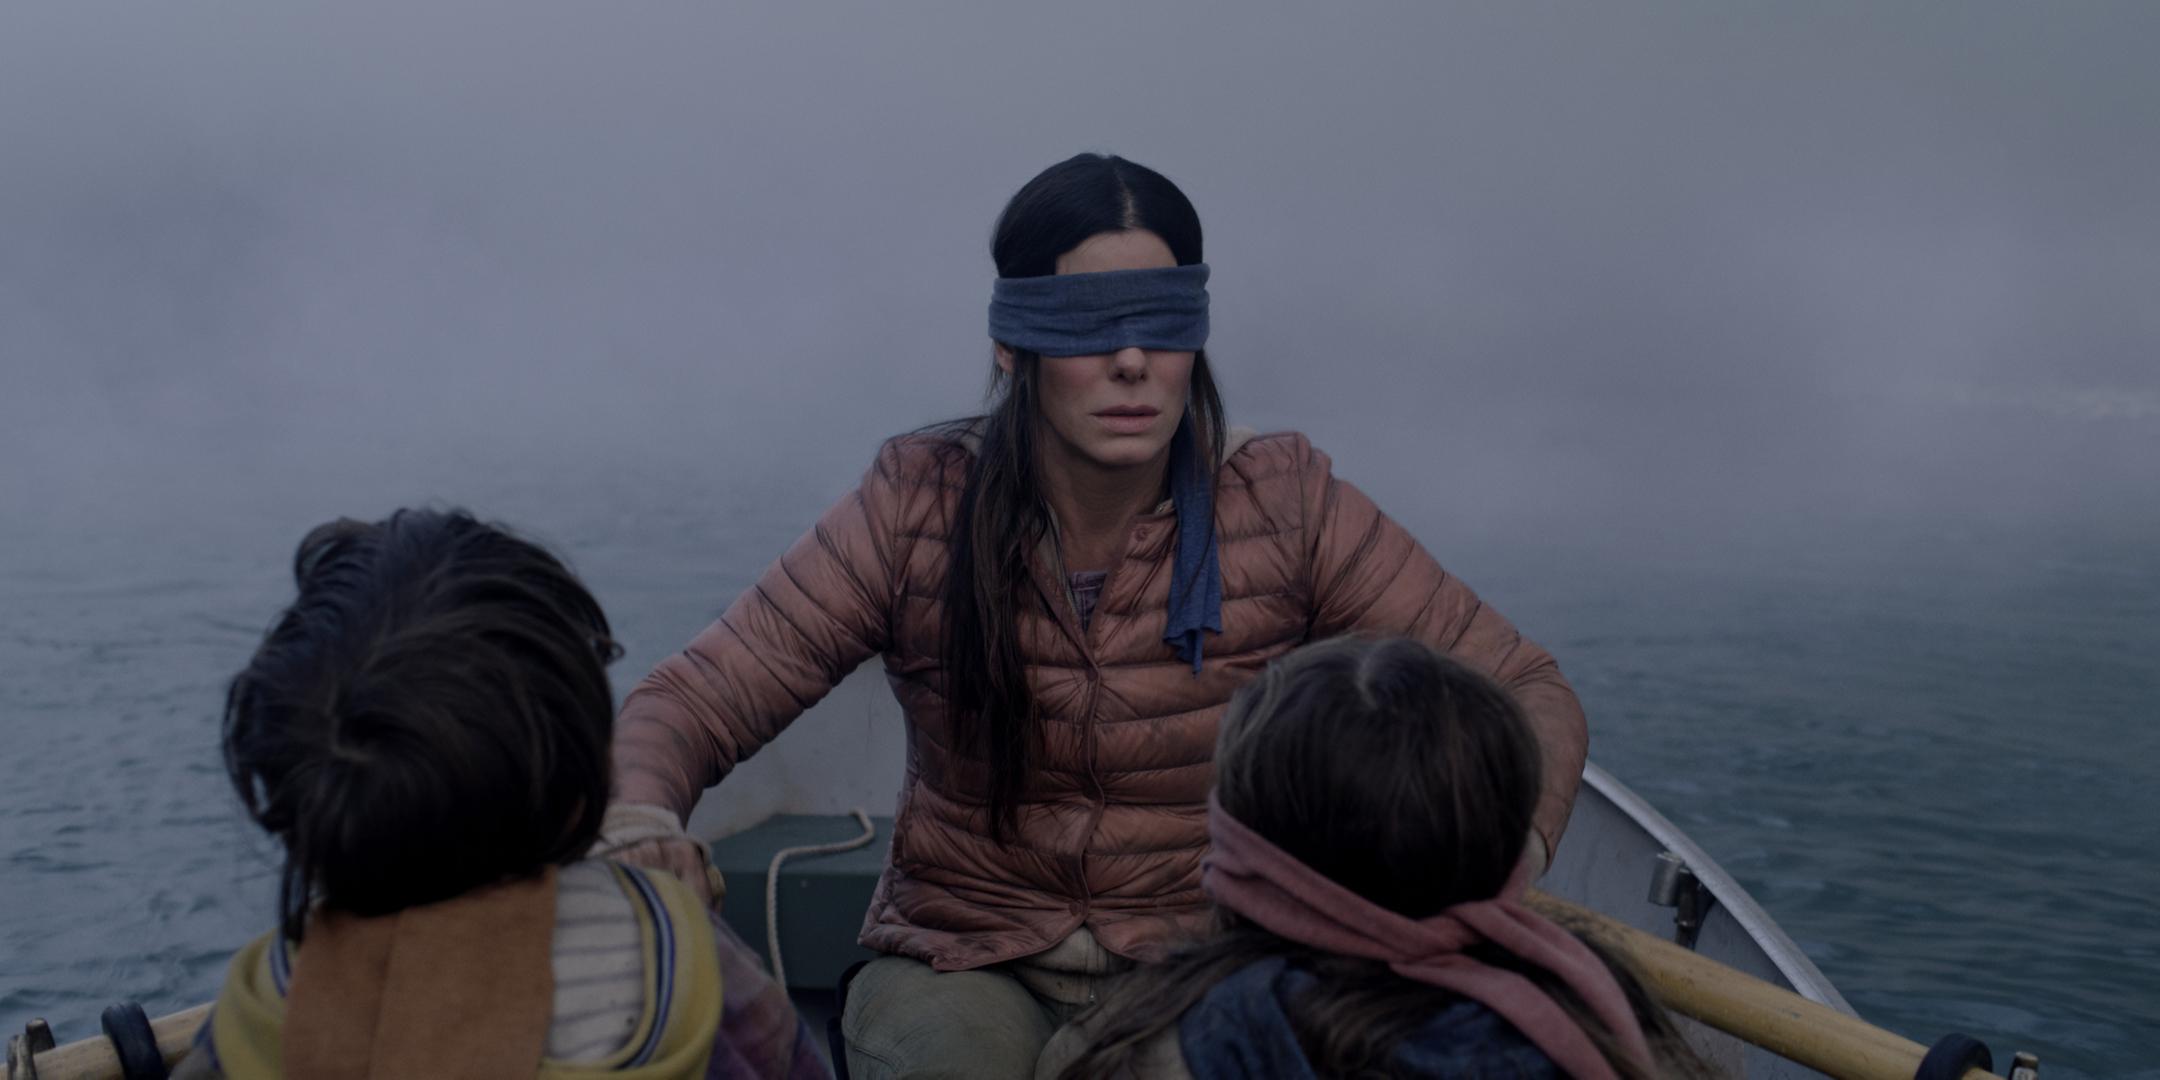 Sandra Bullock rowing a boat wearing a blindfold in a scene from Netflix original movie Bird Box.